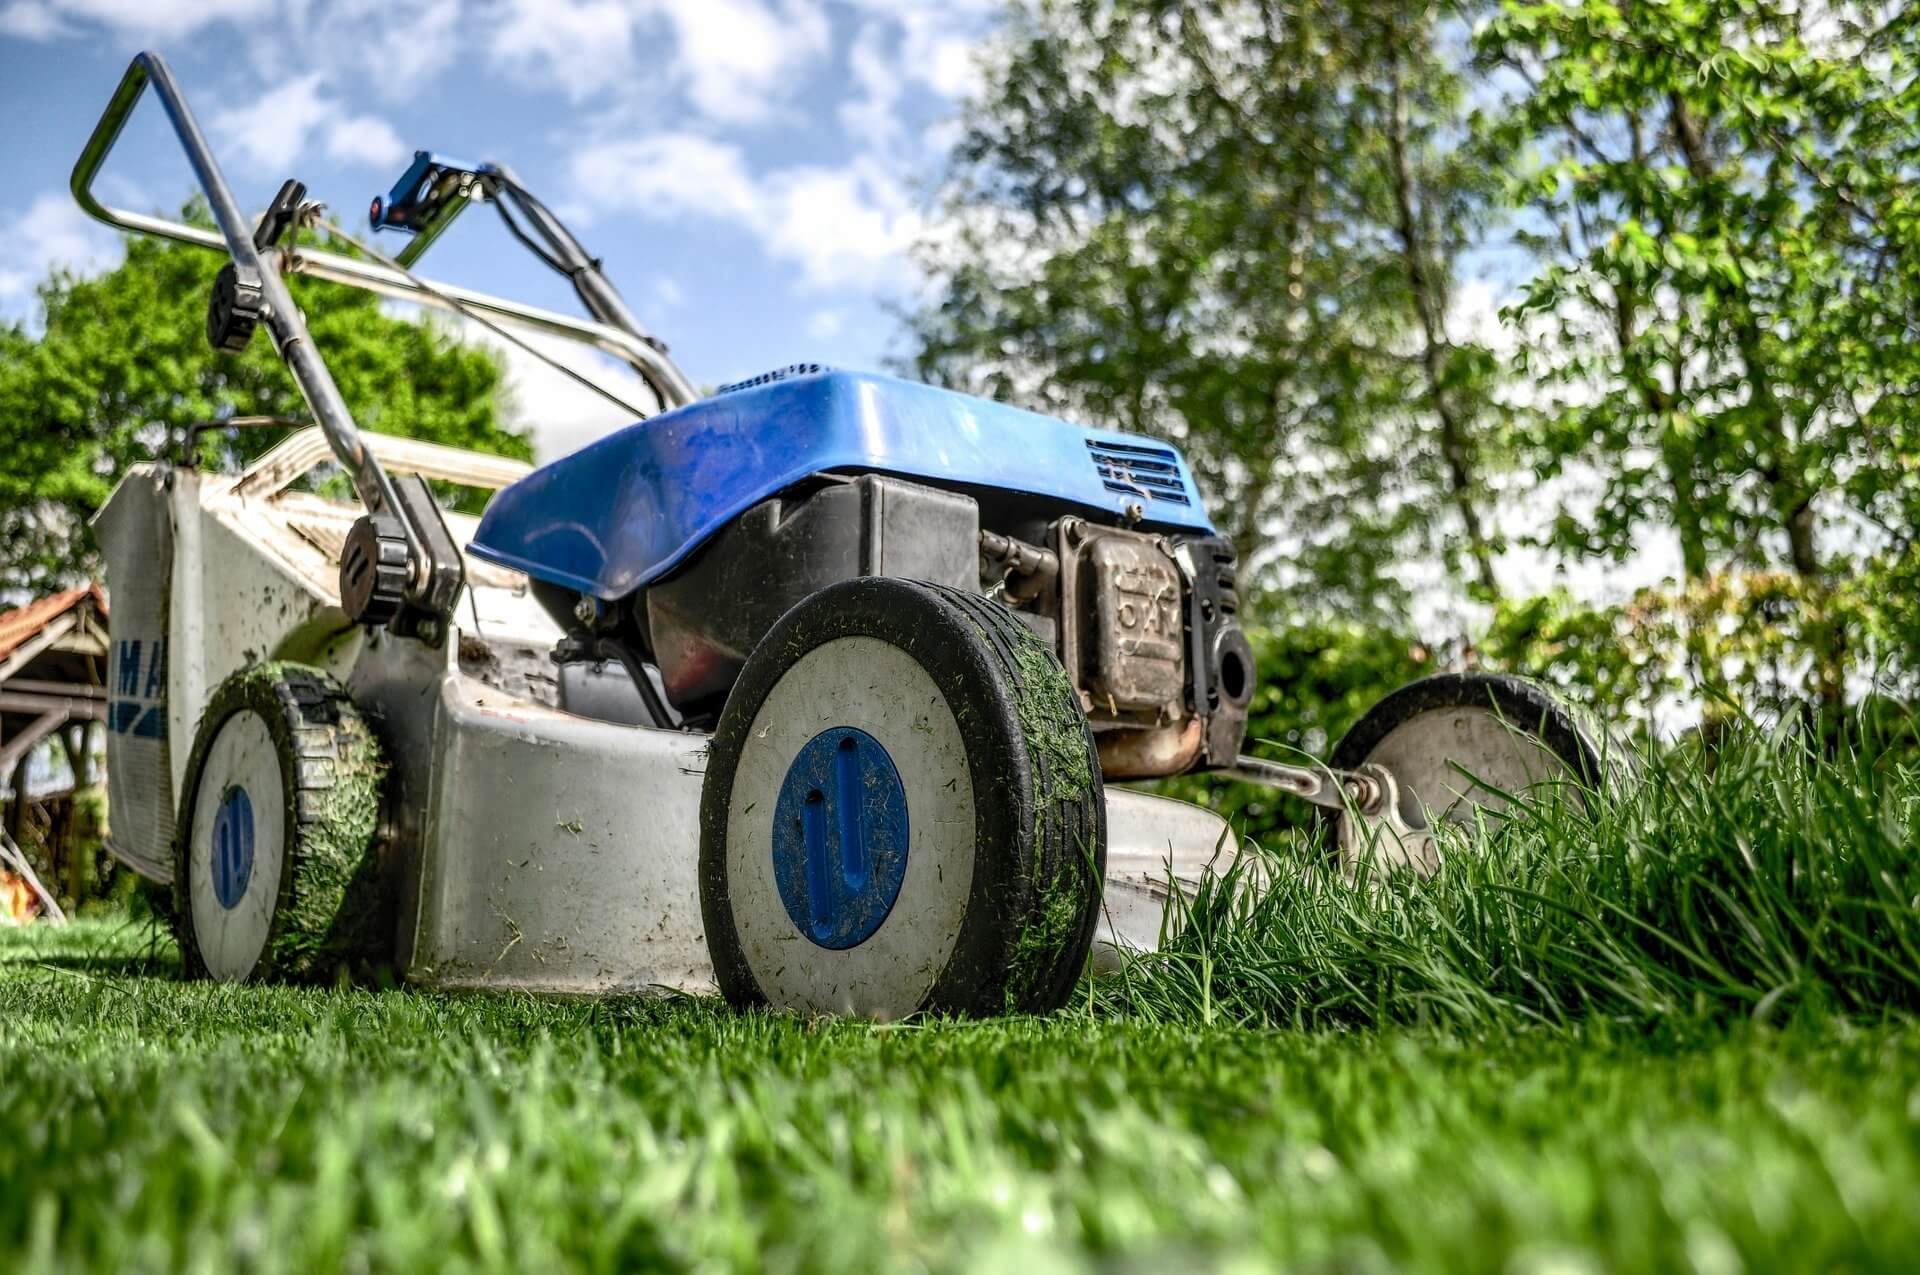 Blue Lawn Mower